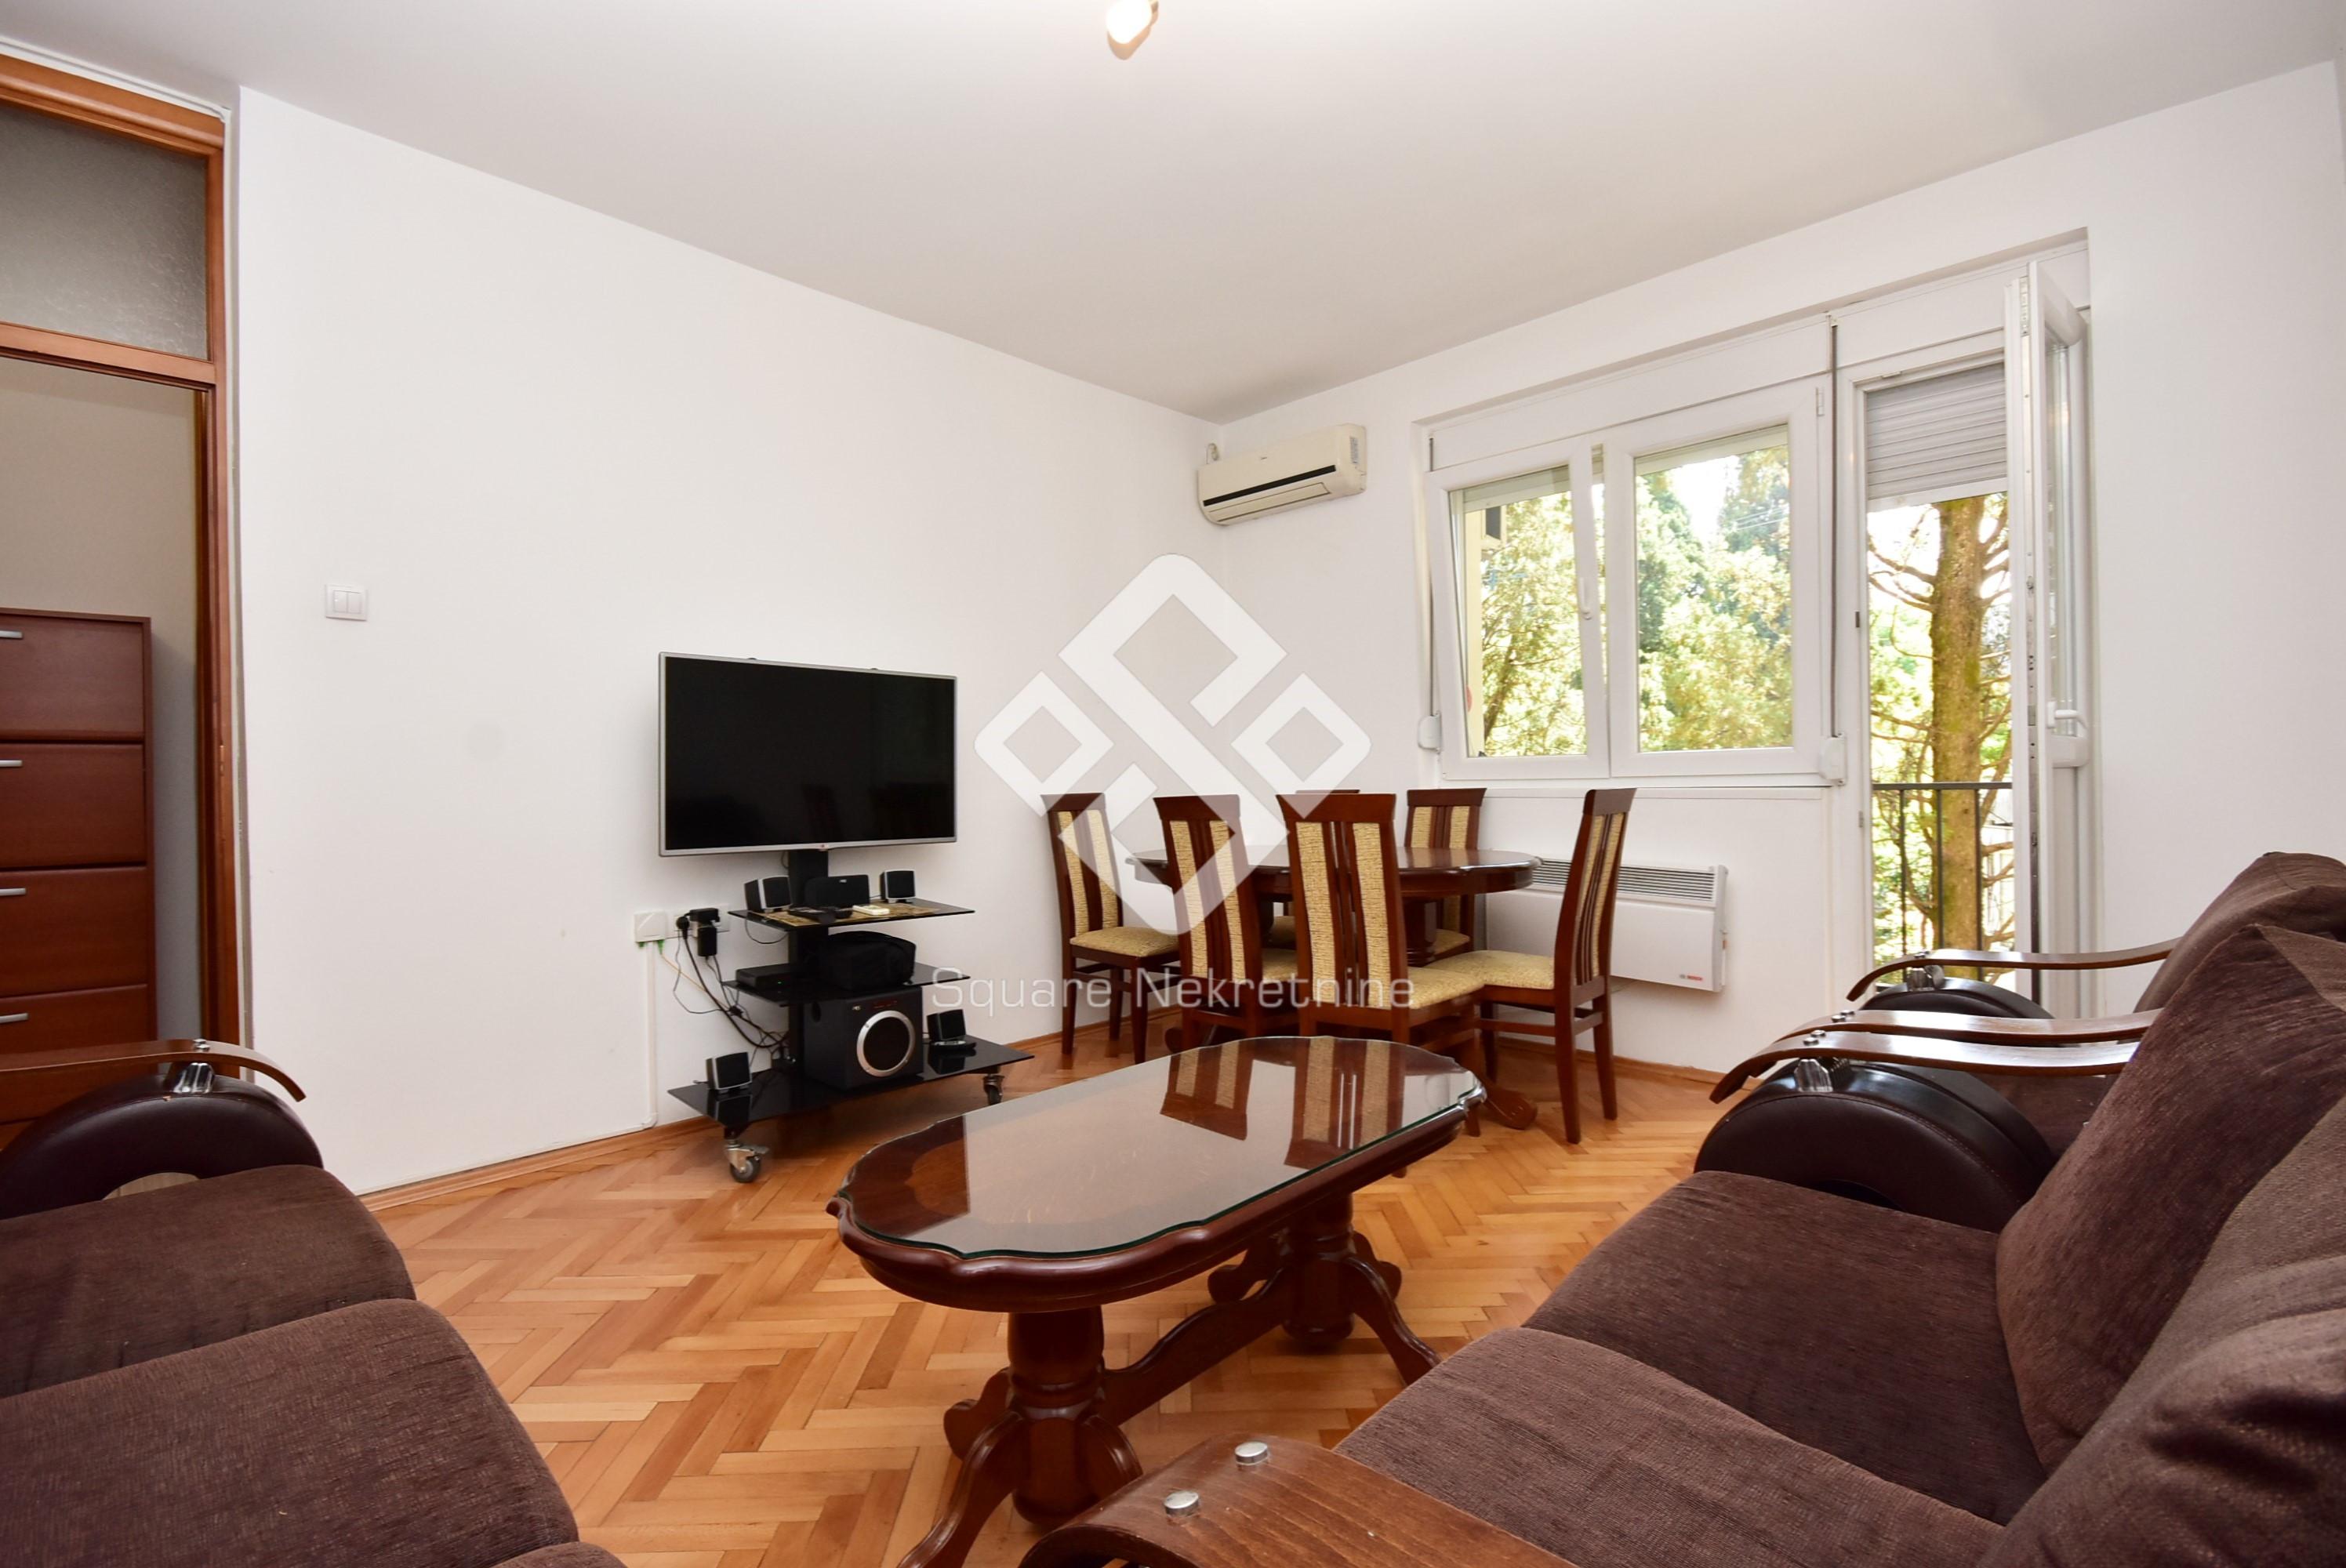 Dvosoban stan 62m2, namjesten, Preko Morace